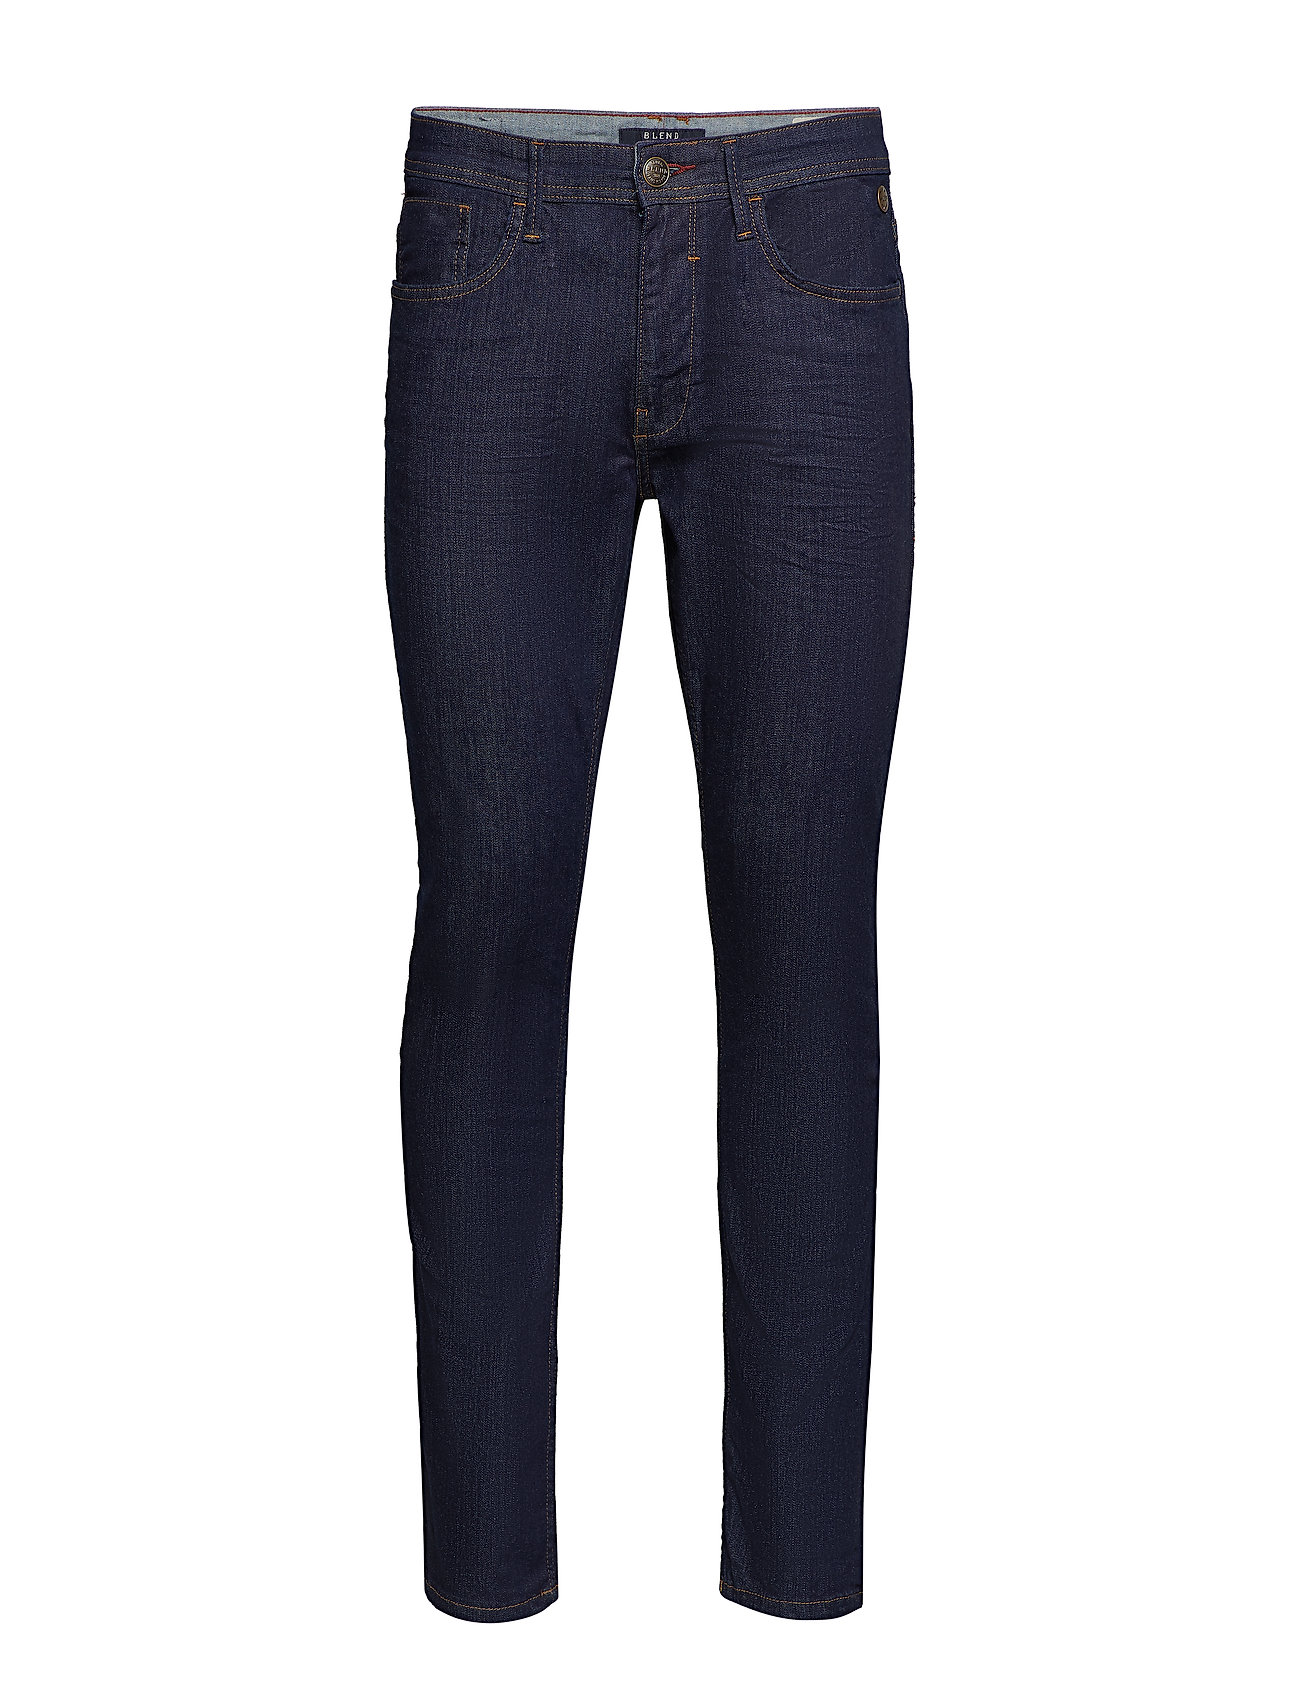 Blend Jeans Multiflex - DENIM DARK BLUE